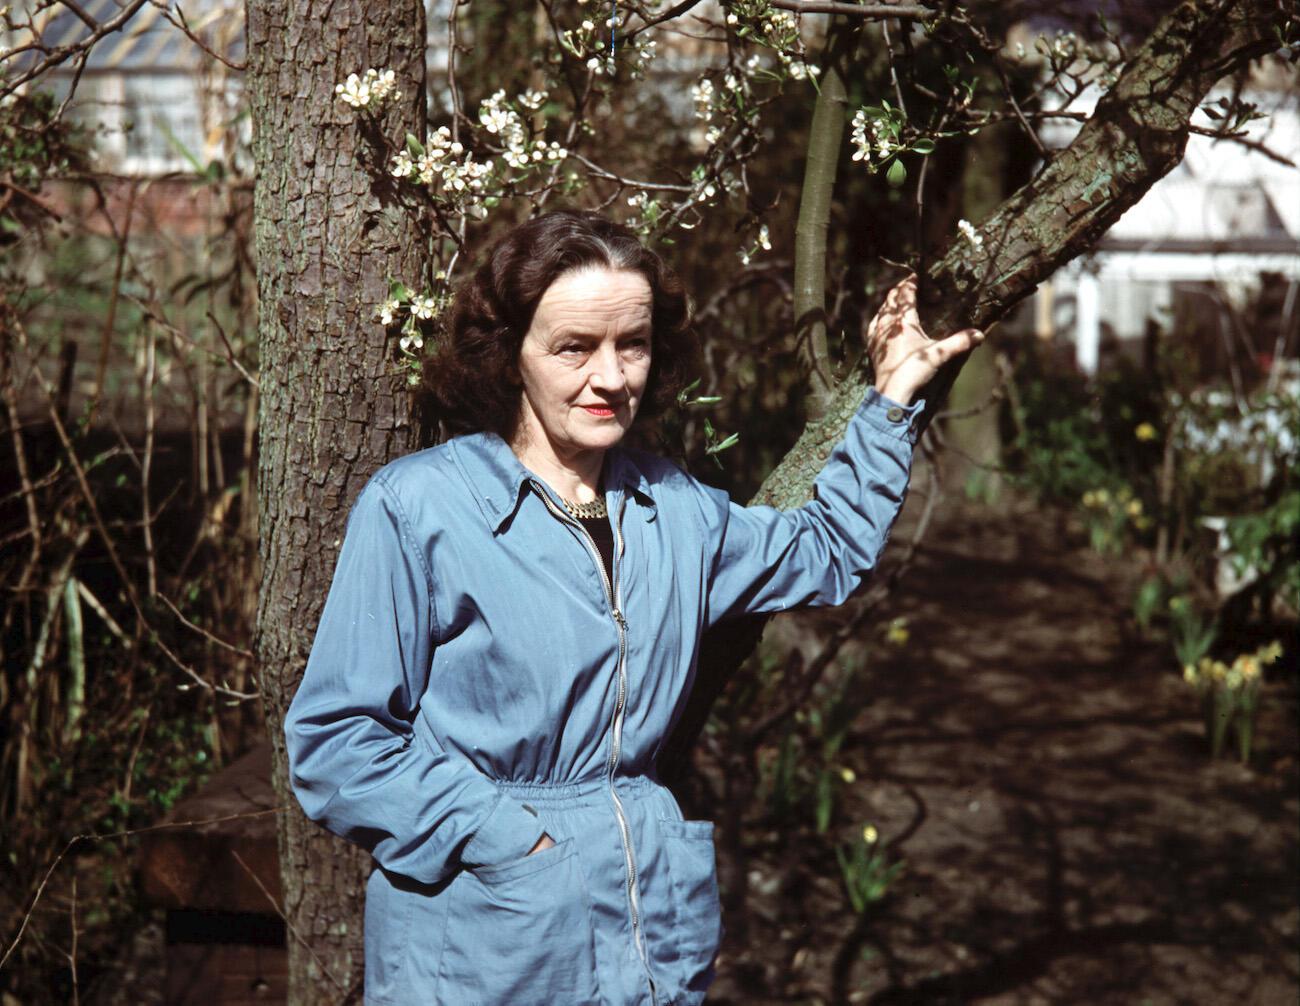 Barbara Hepworth in work jumpsuit standing next to a tree